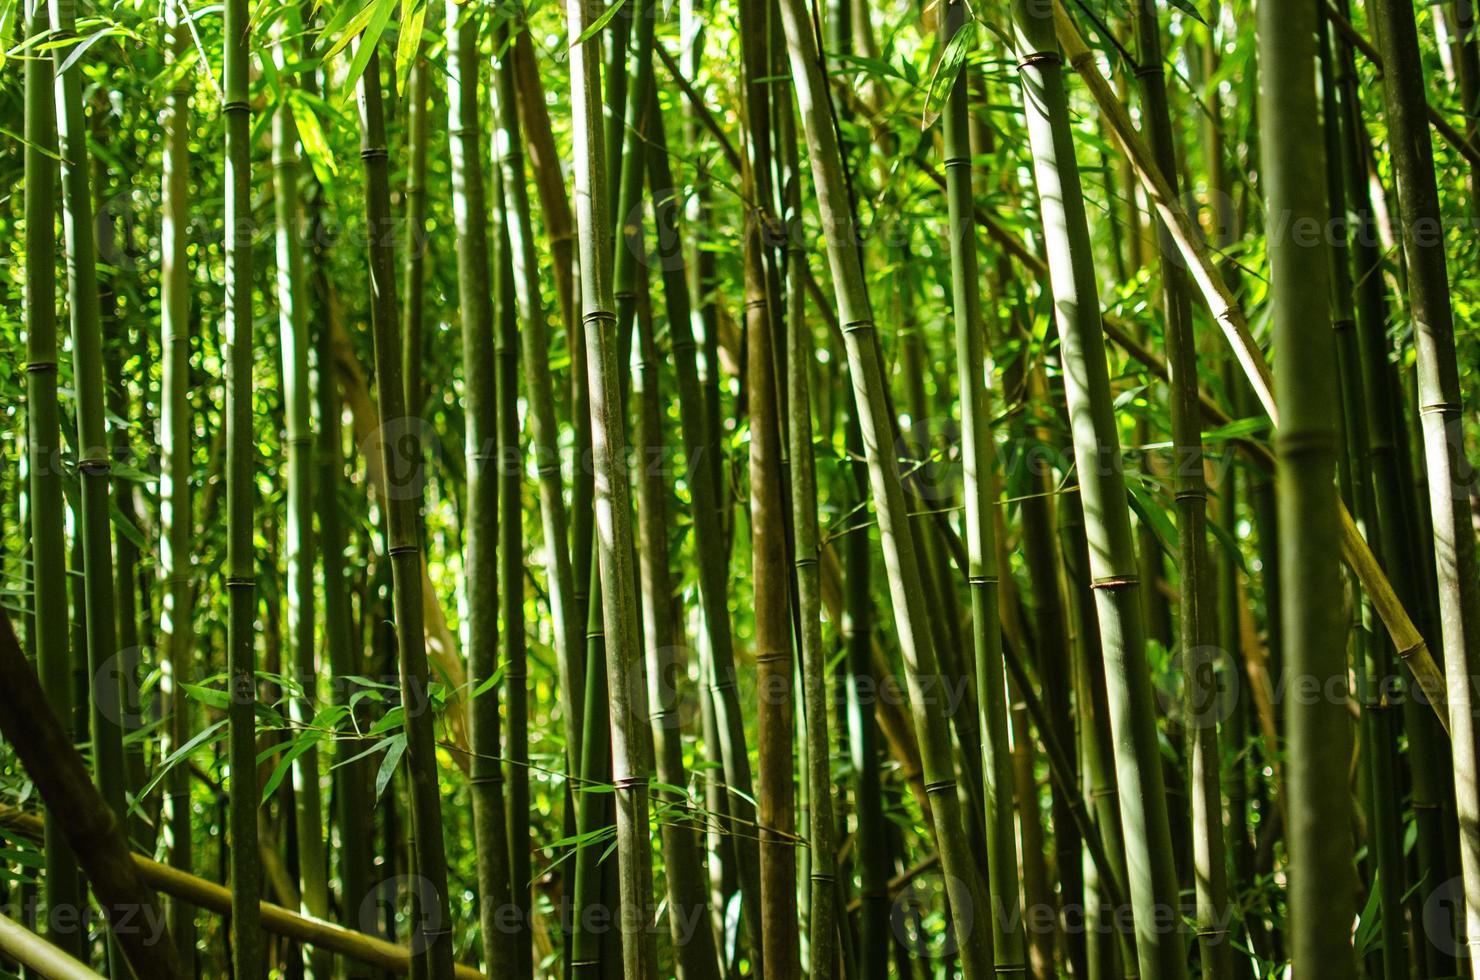 bamboe close-up foto